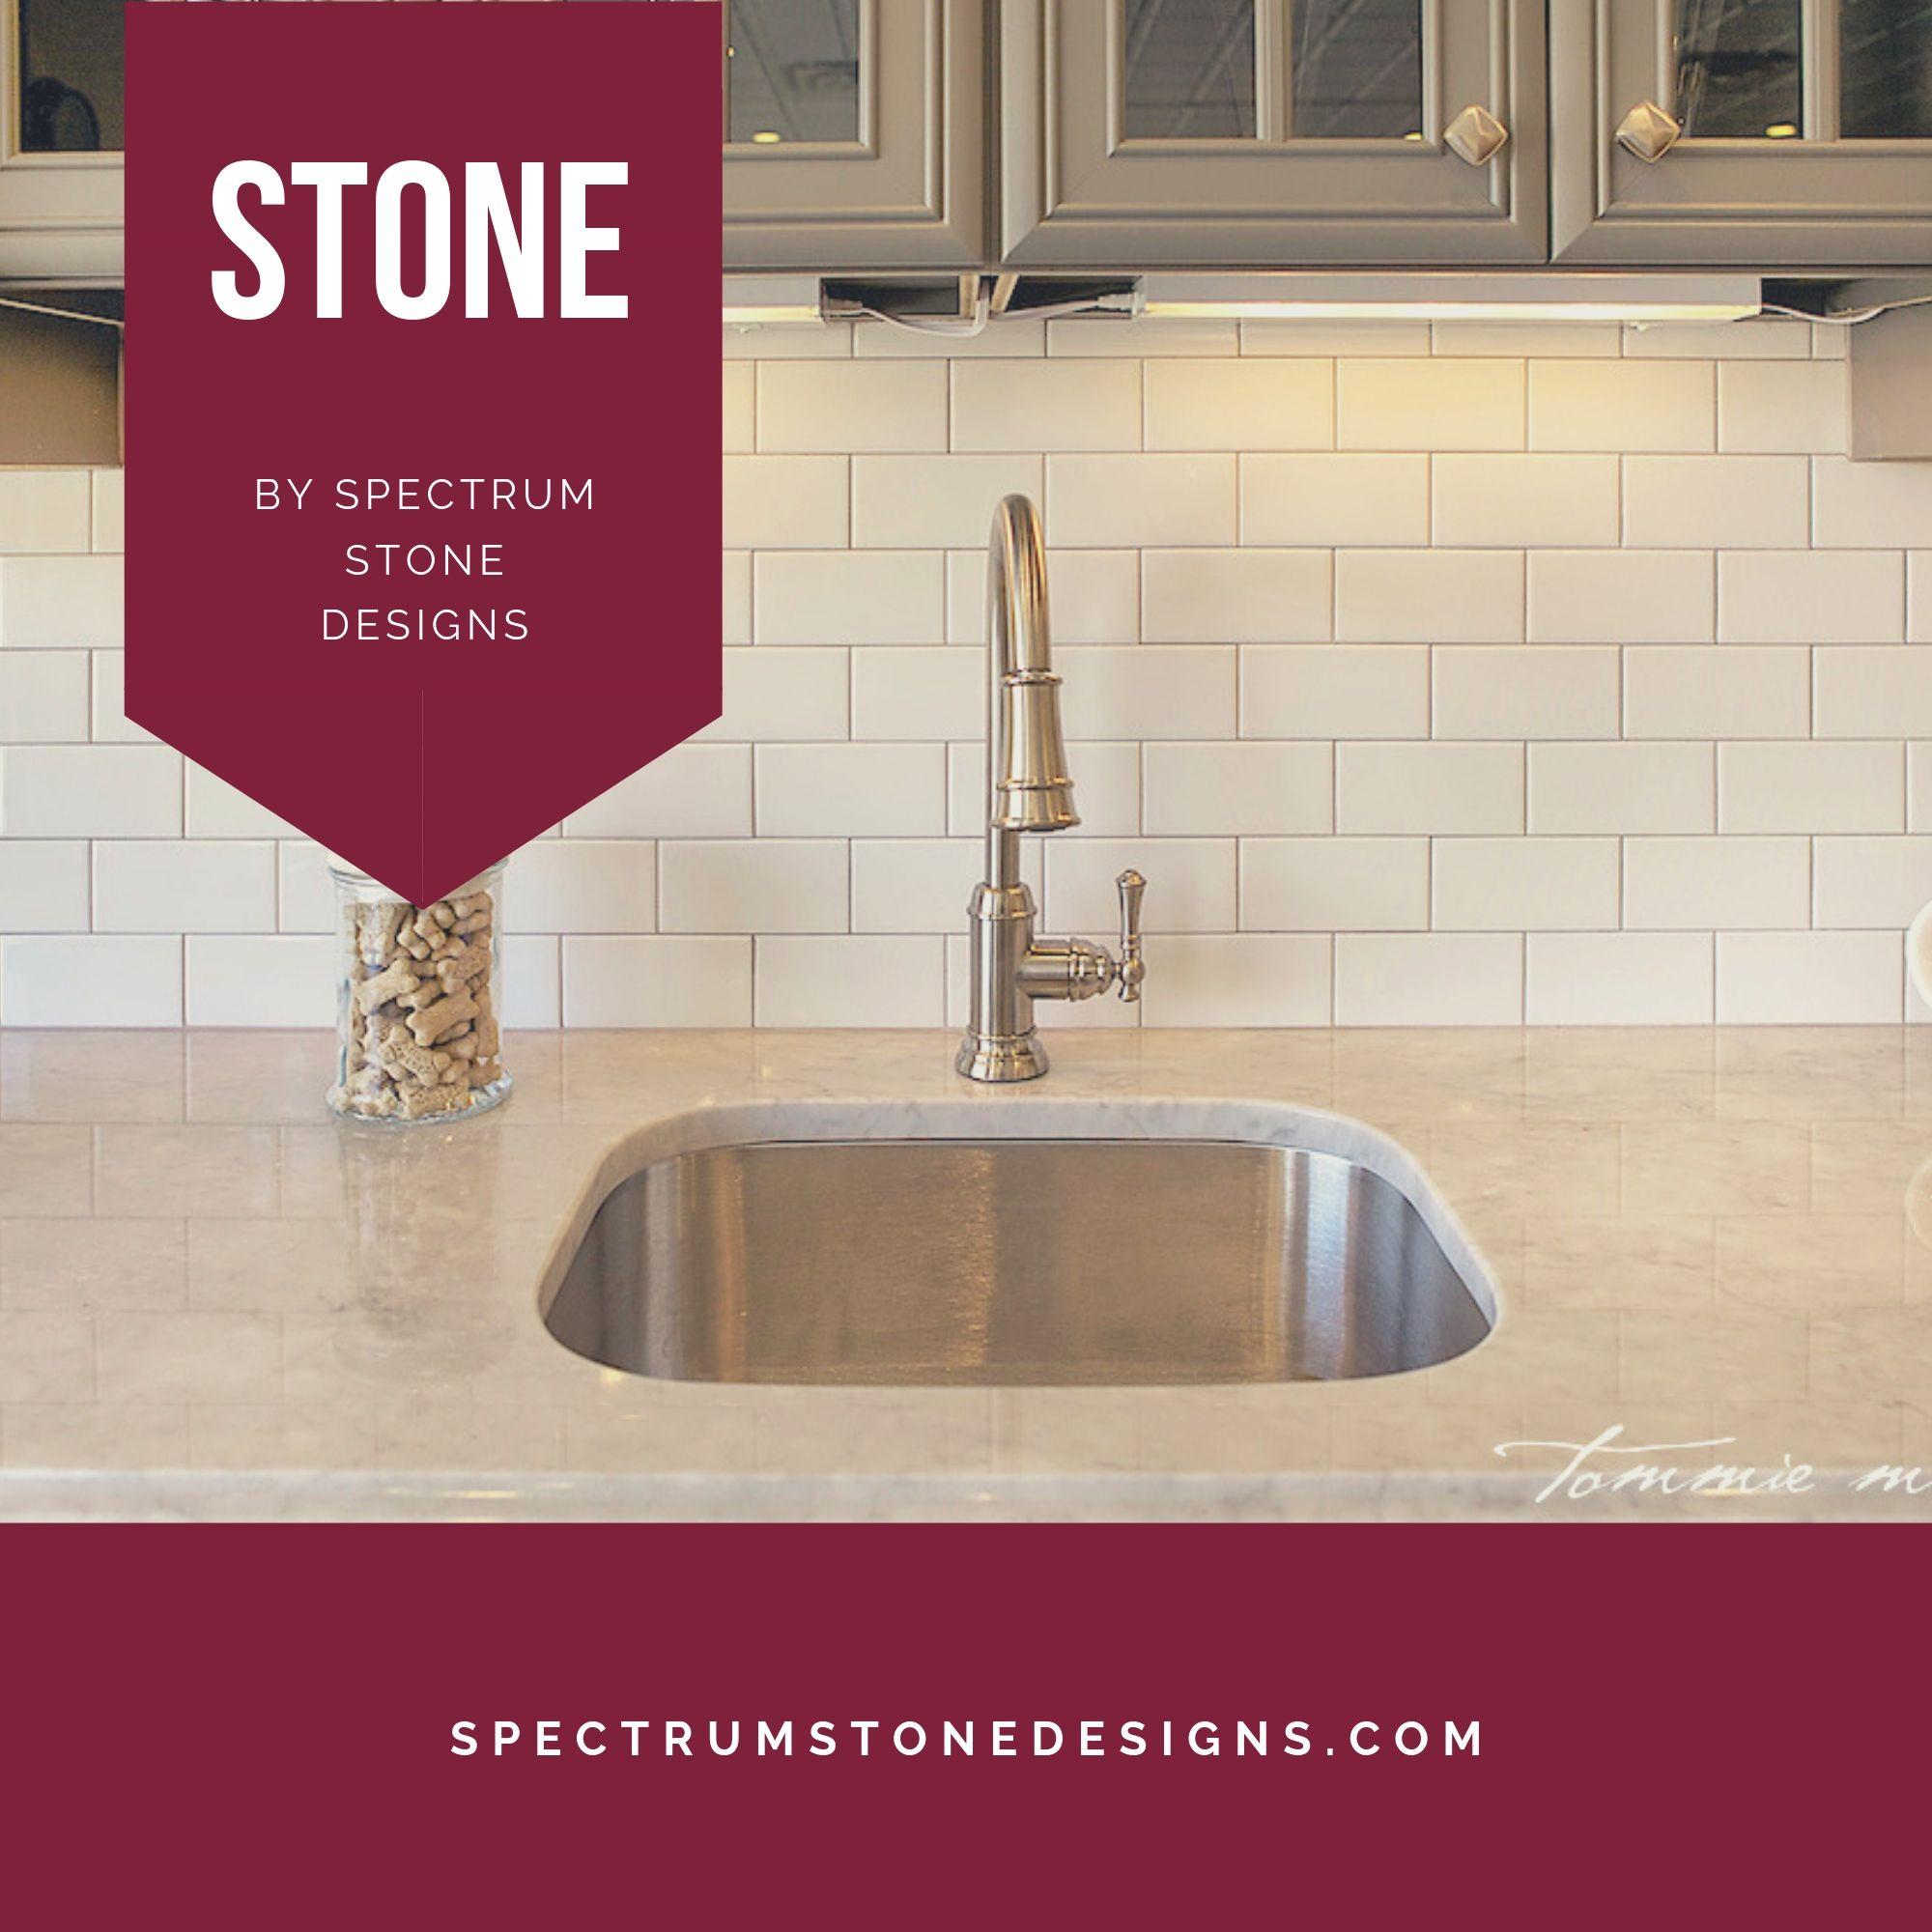 Granite Marble Quartz Naturalstone Spectrumstonedesigns Lynchburg Charlottesville Roanoke Vir Stone Design Stone Countertops Natural Stone Countertops